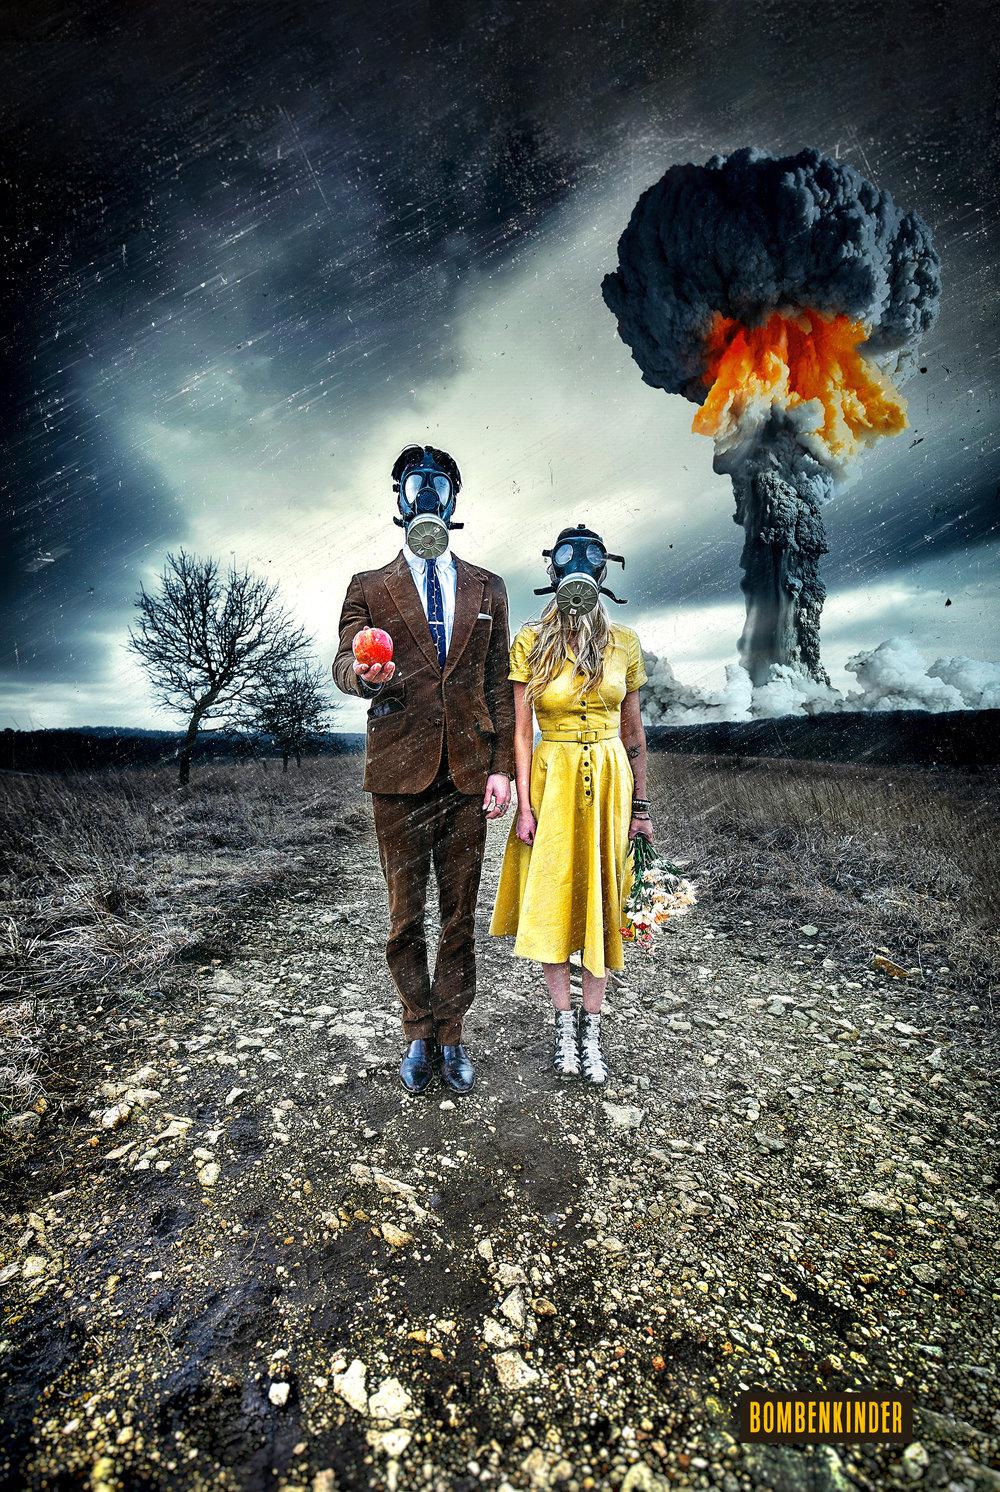 Bombenkinder-poster-web-with-logo.jpg